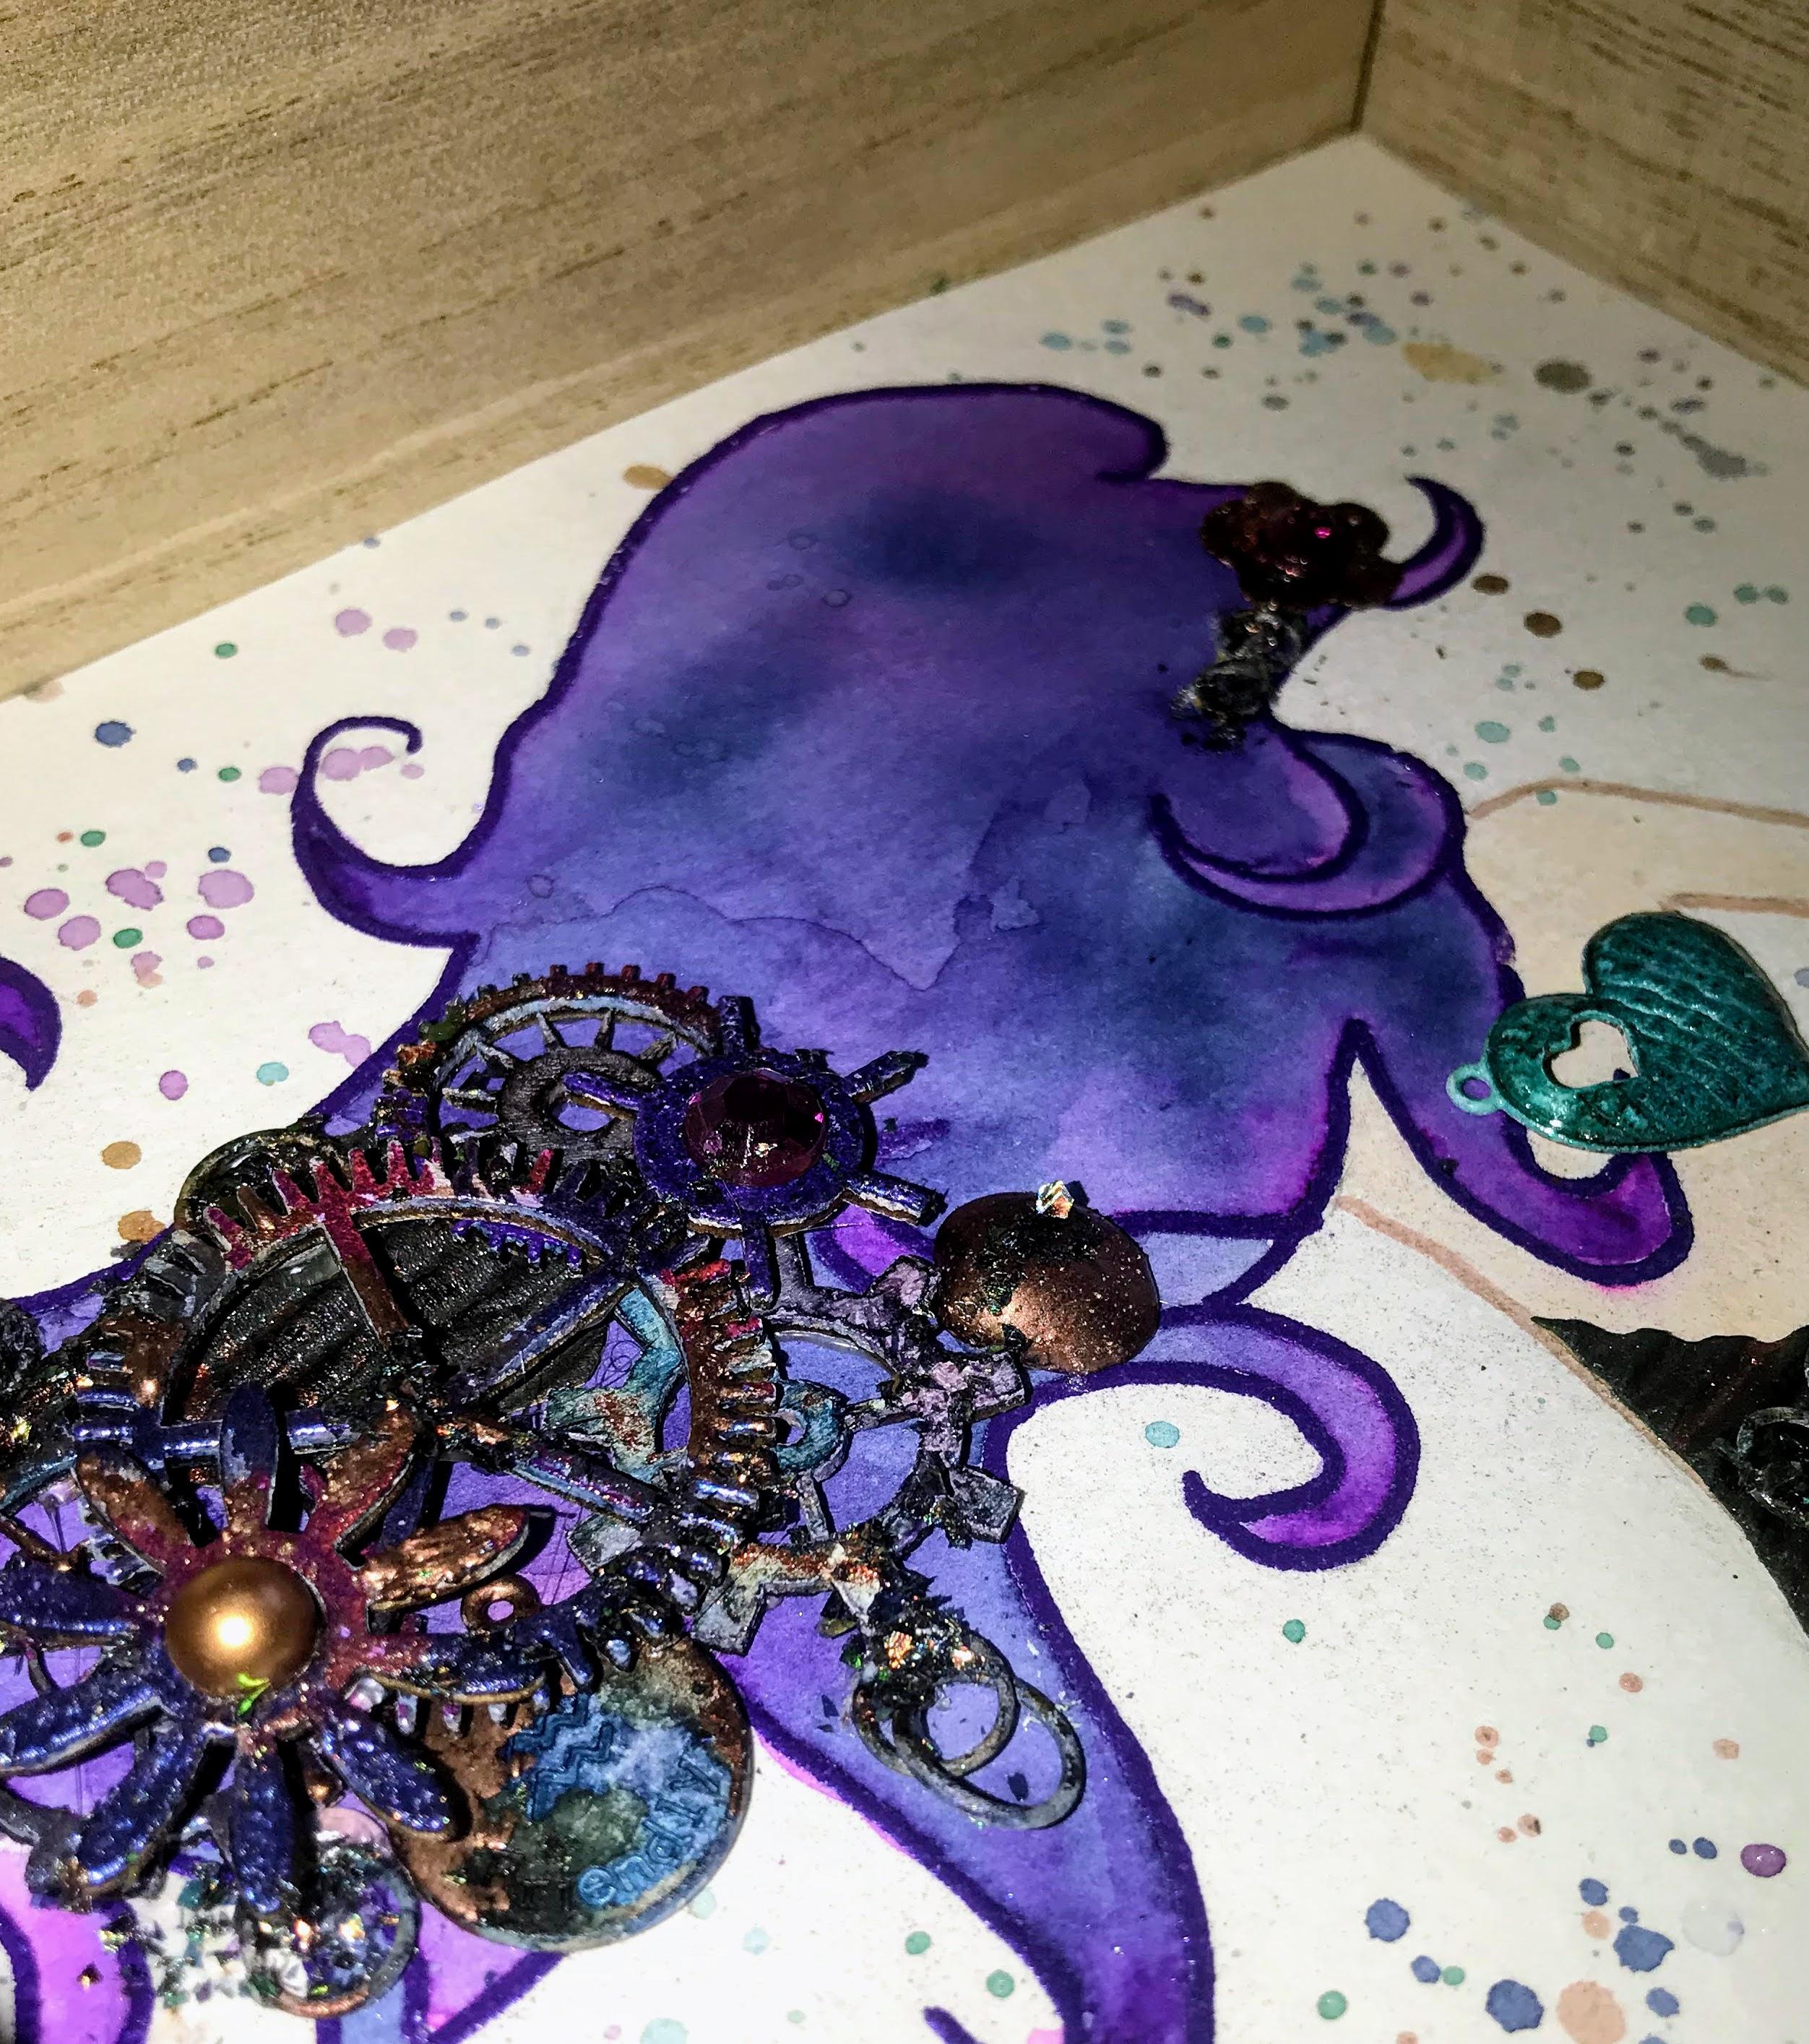 sp-mermaid-hair-close-up.jpg